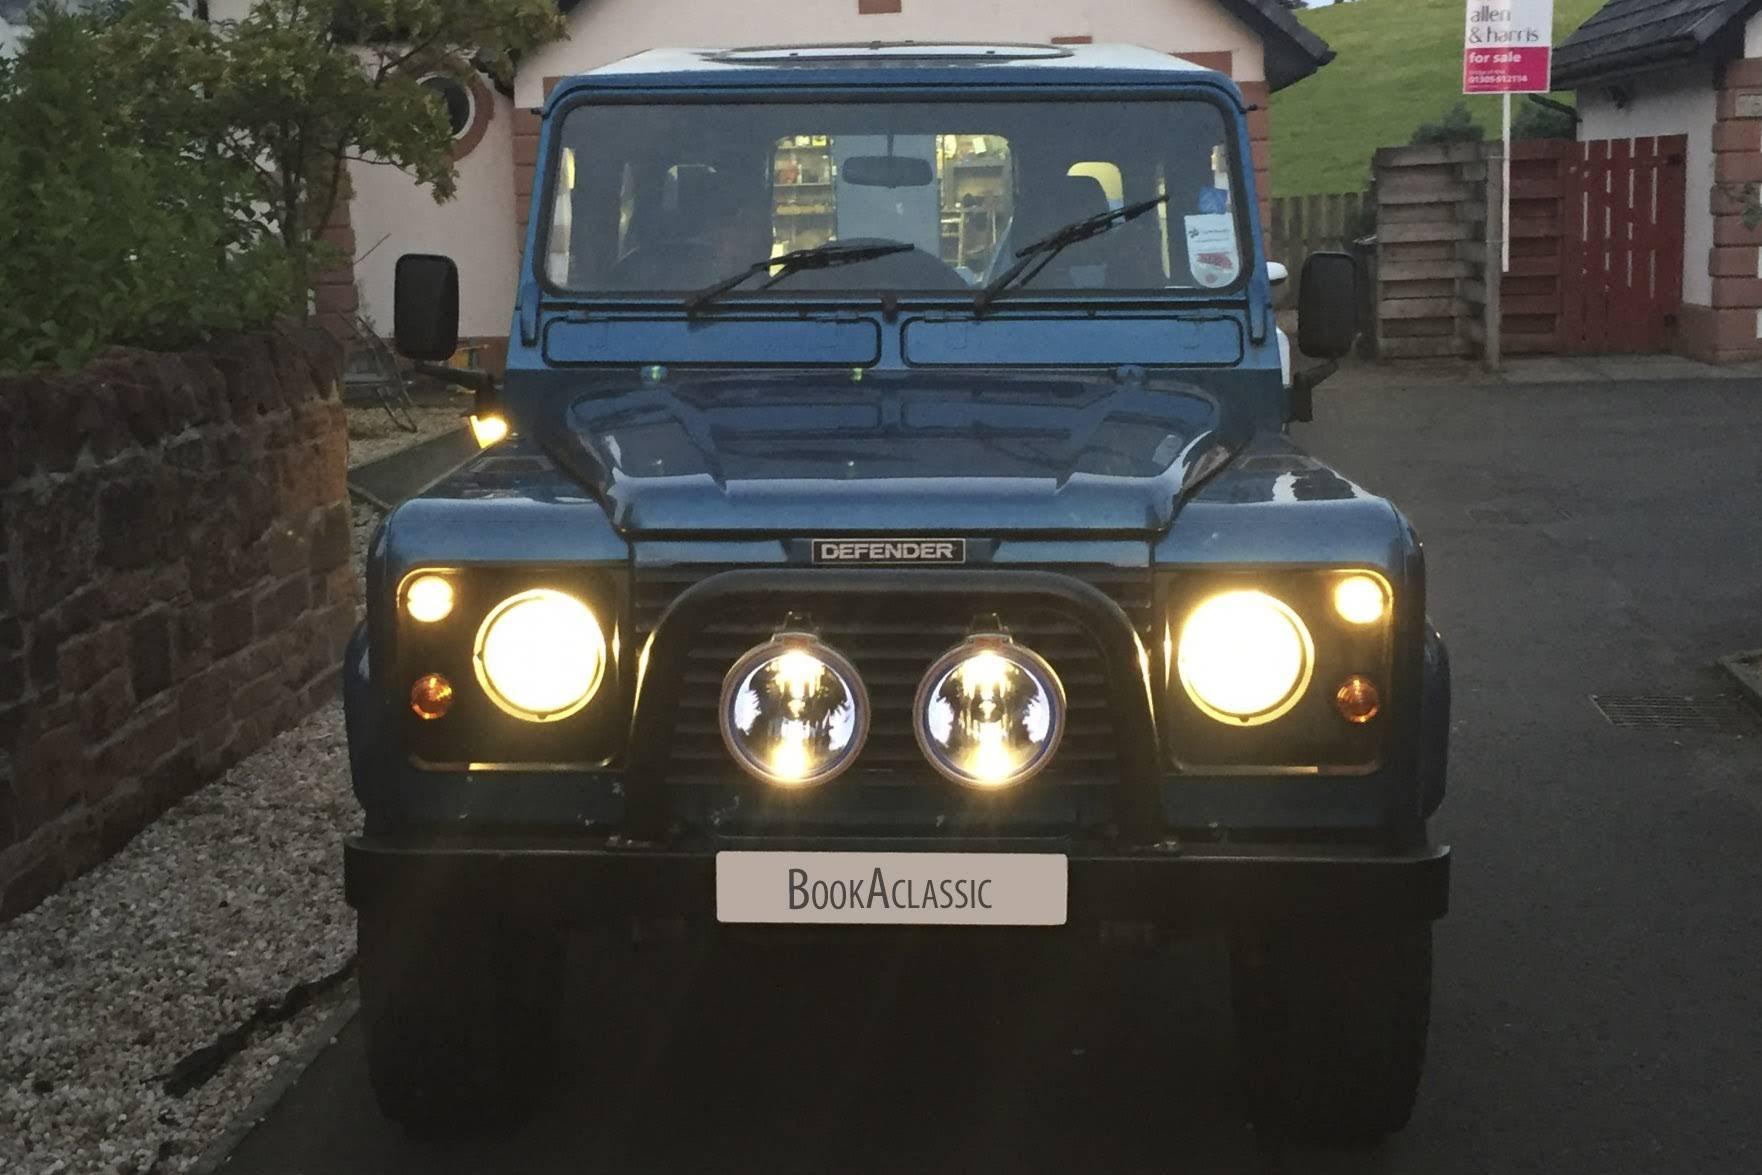 Land Rover Defender 90 BookAclassic